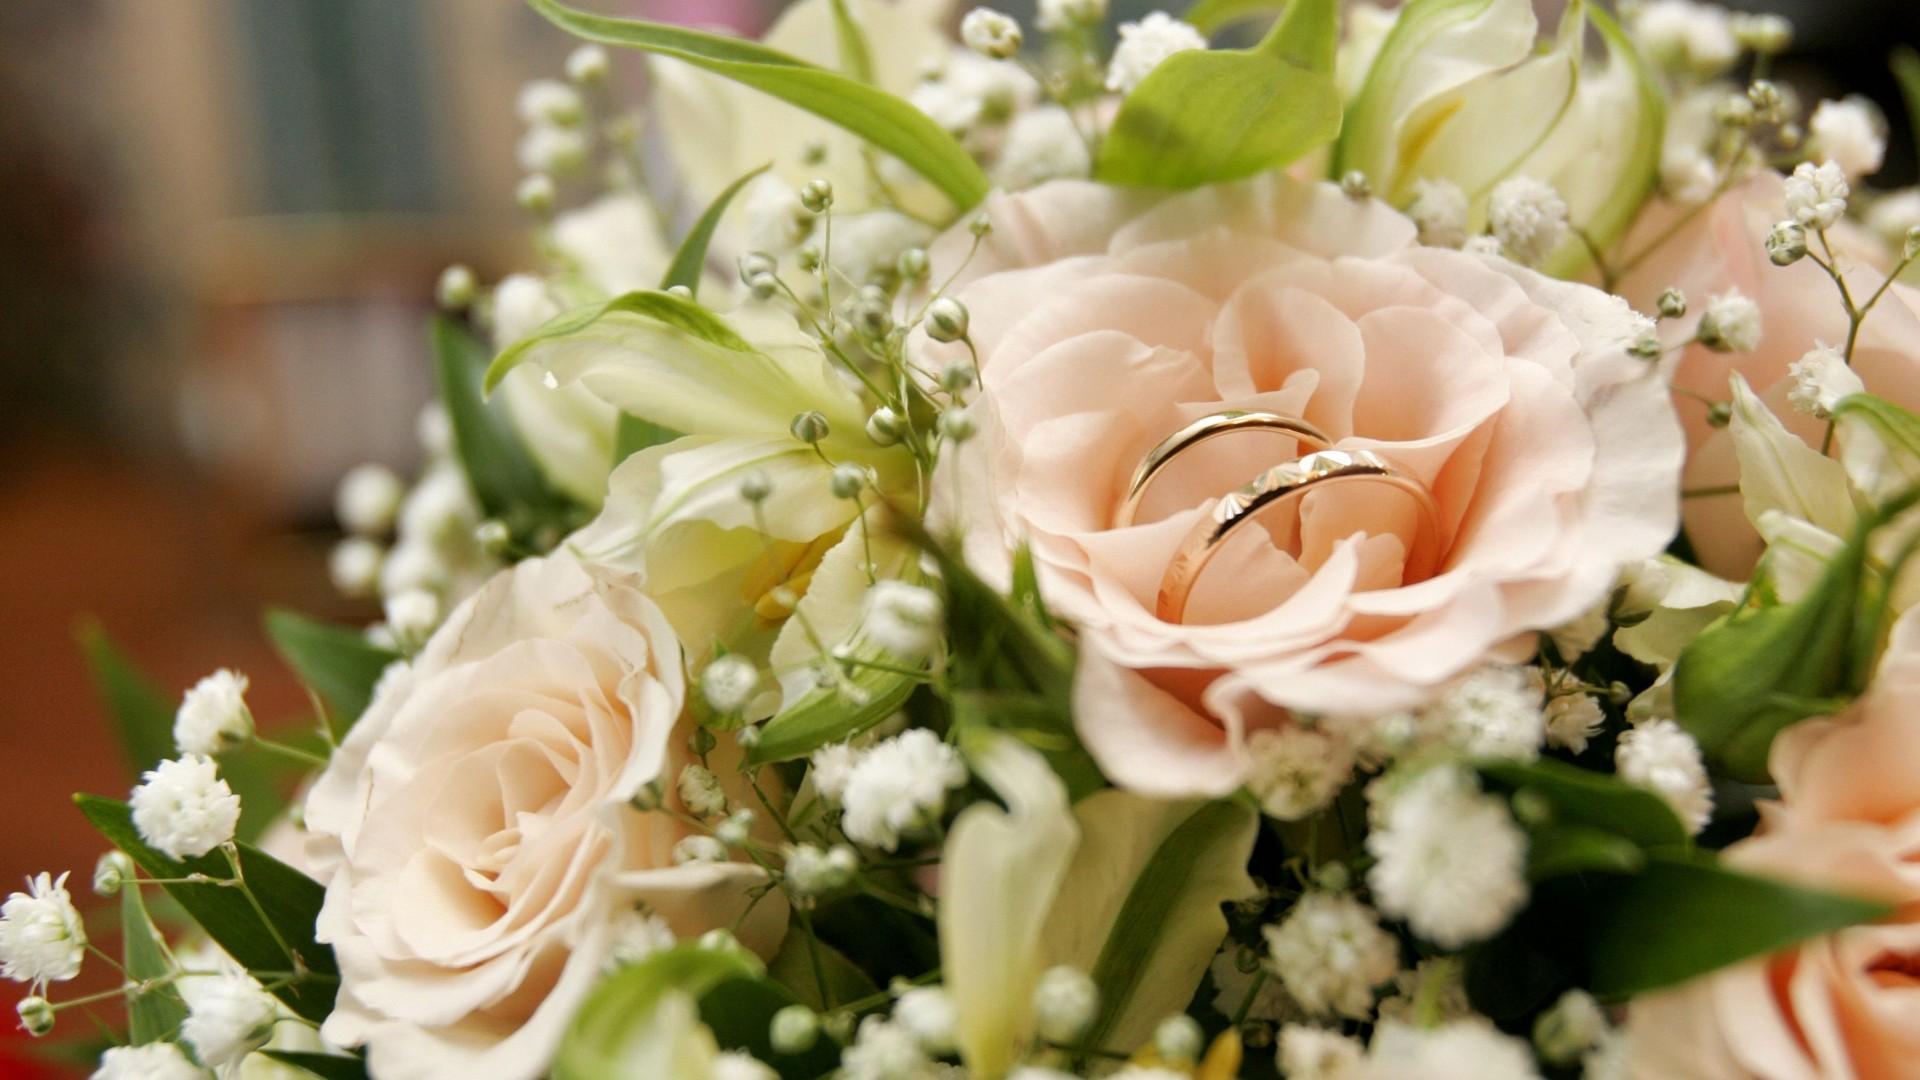 wedding  bouquet  roses  flower   Free  HD Wallpaper